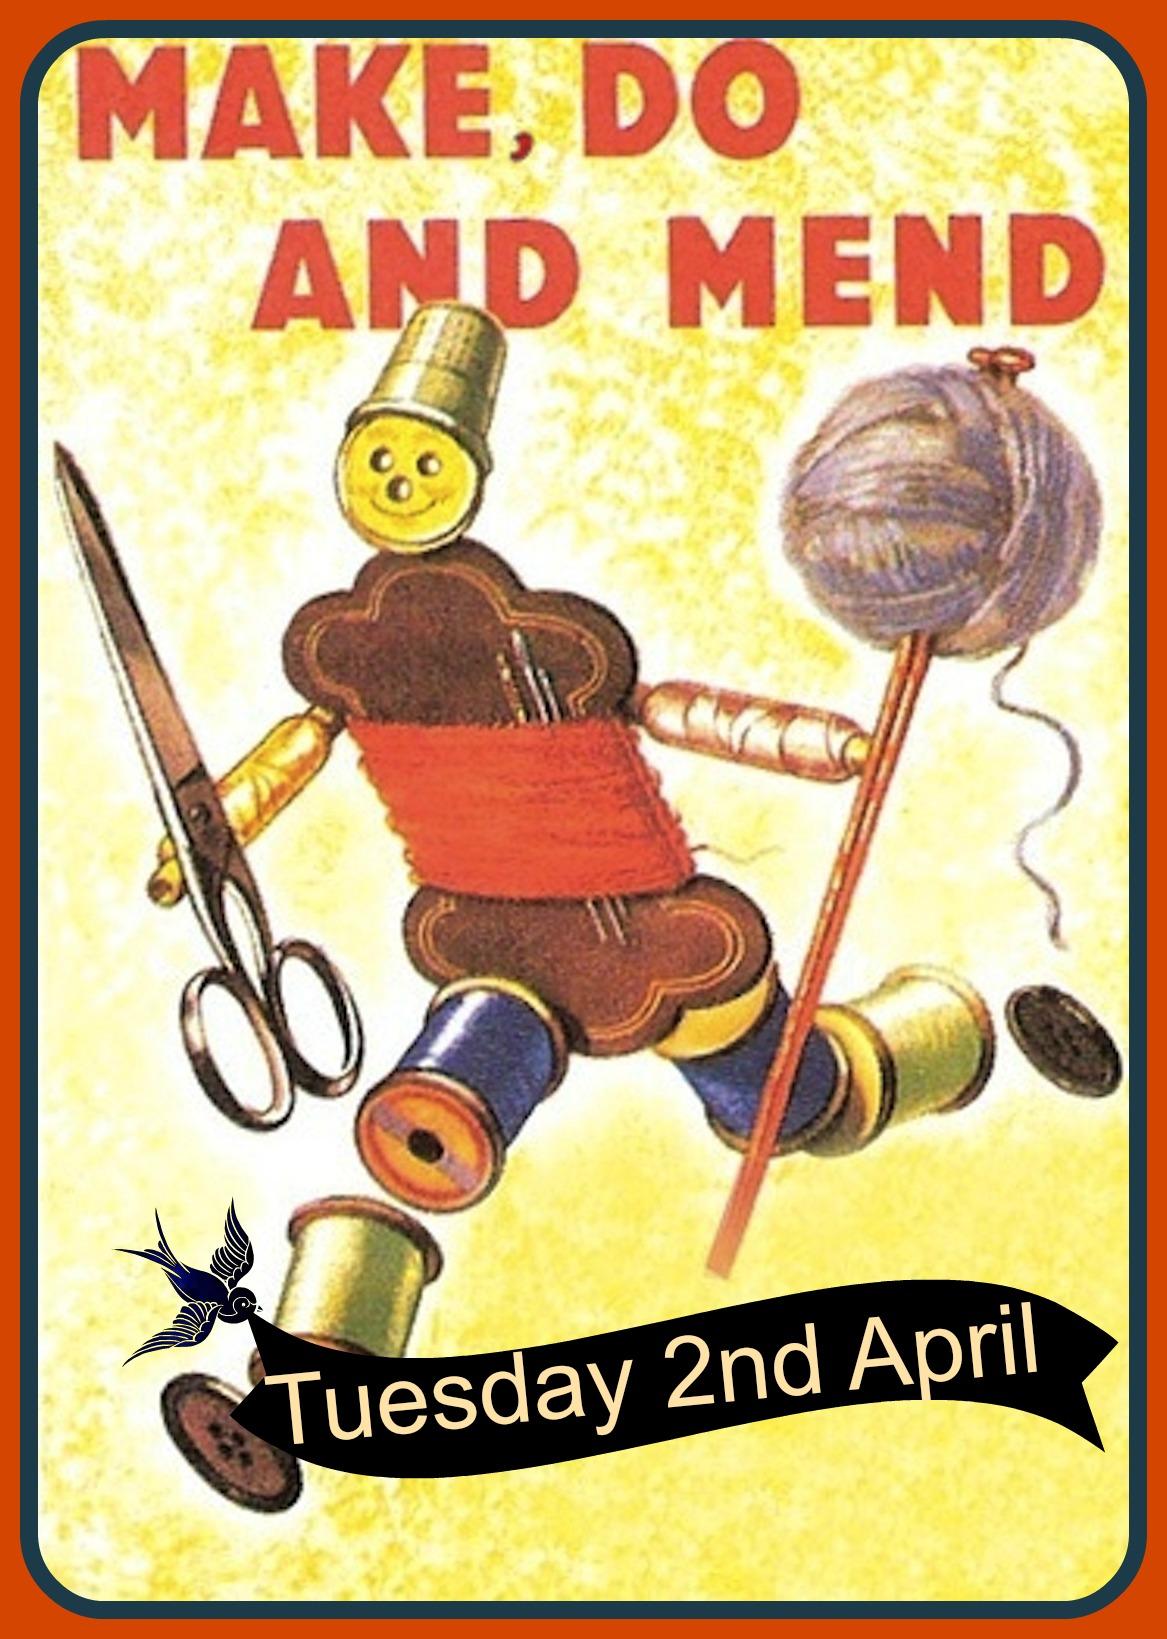 make, do & mend man April 2013